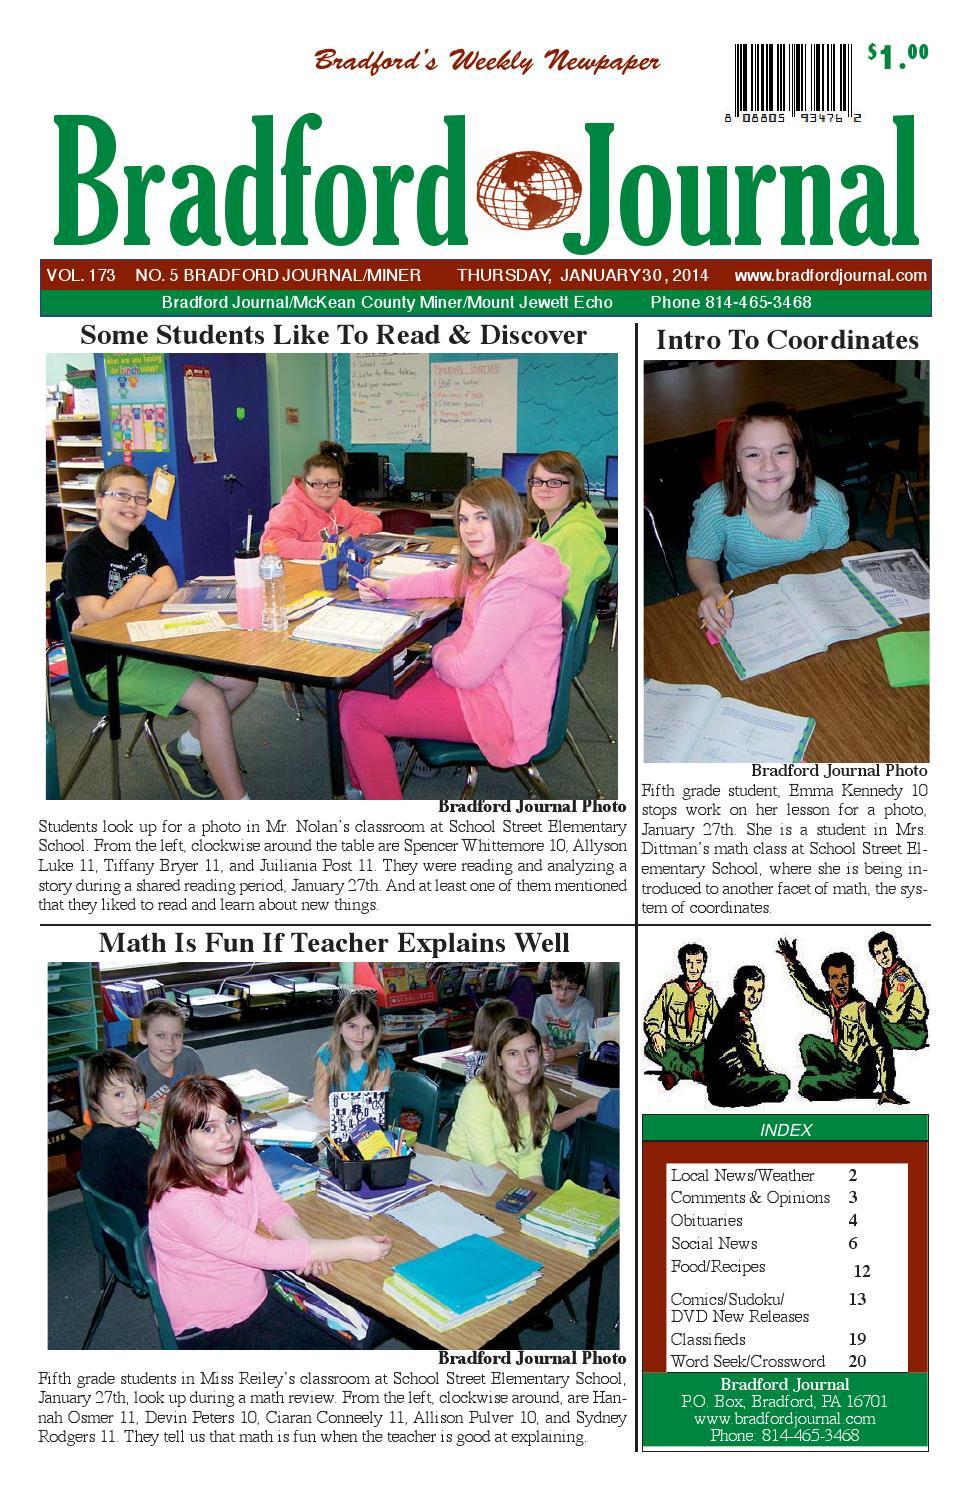 Bradfordjournalcolorissue1 30 14e by Bradford Journal - issuu